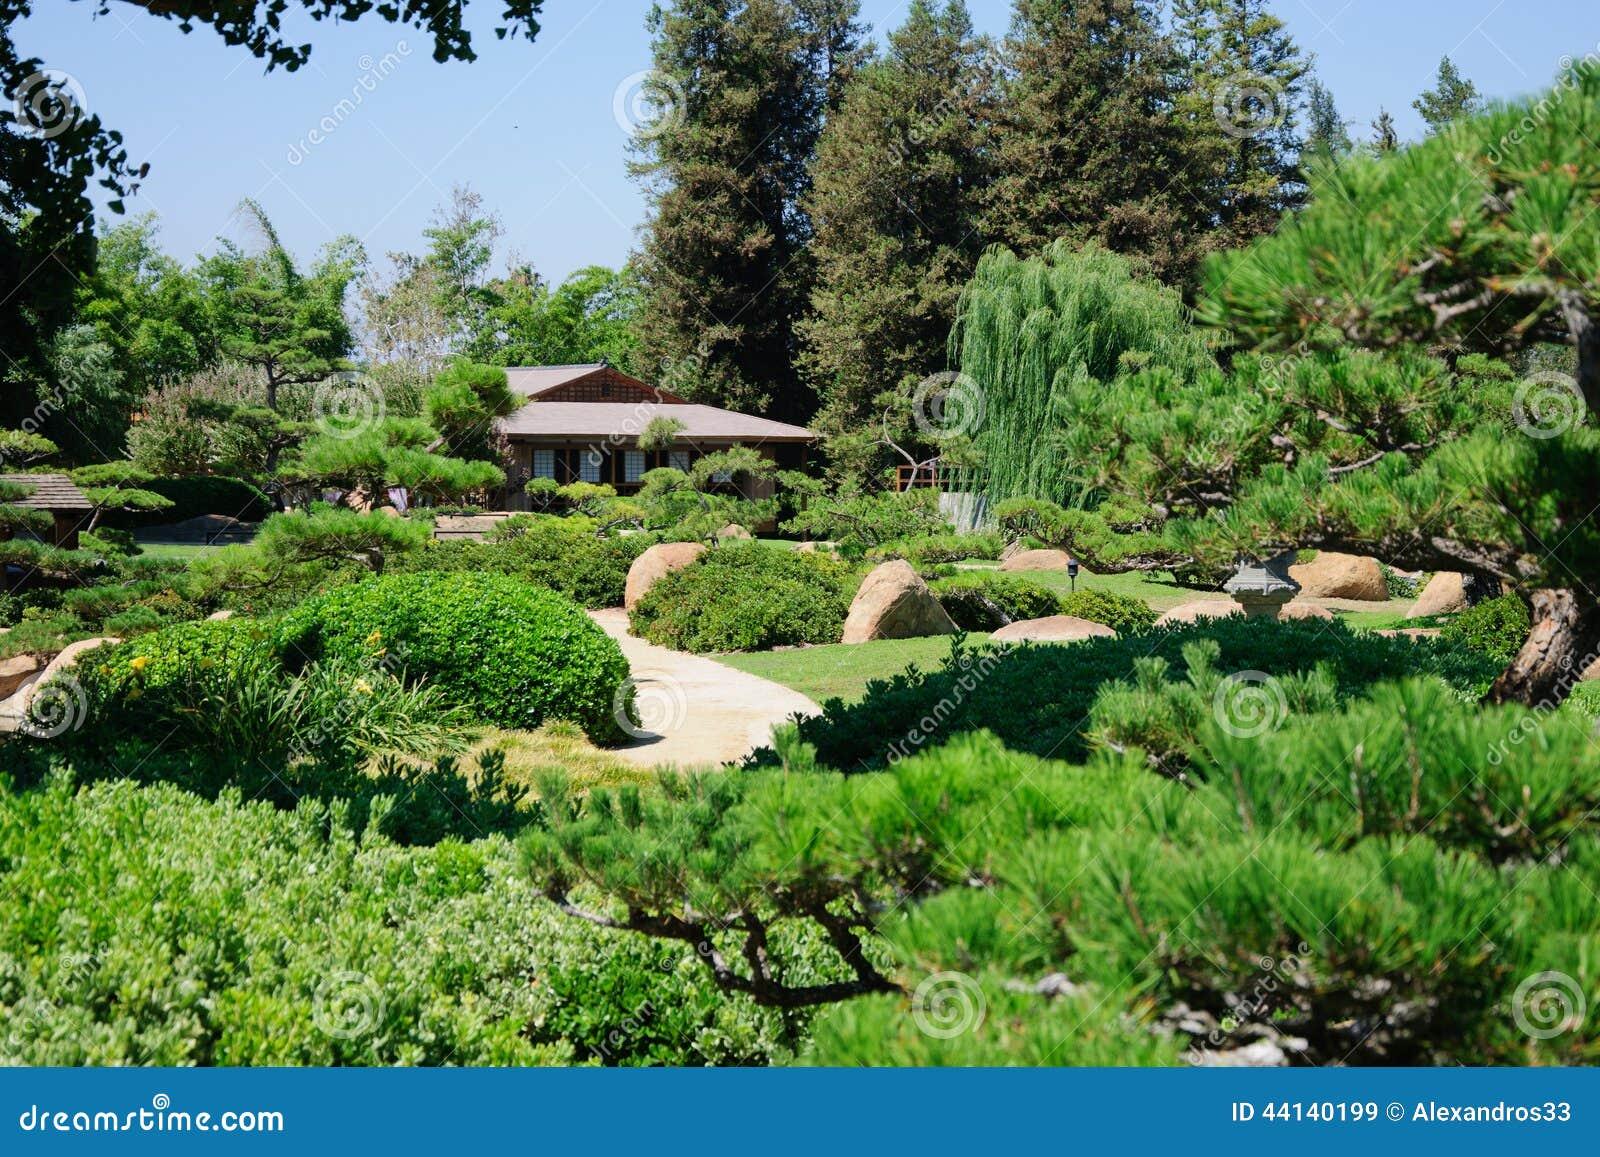 Beautiful View Of Japanese Garden Stock Photo Image 44140199